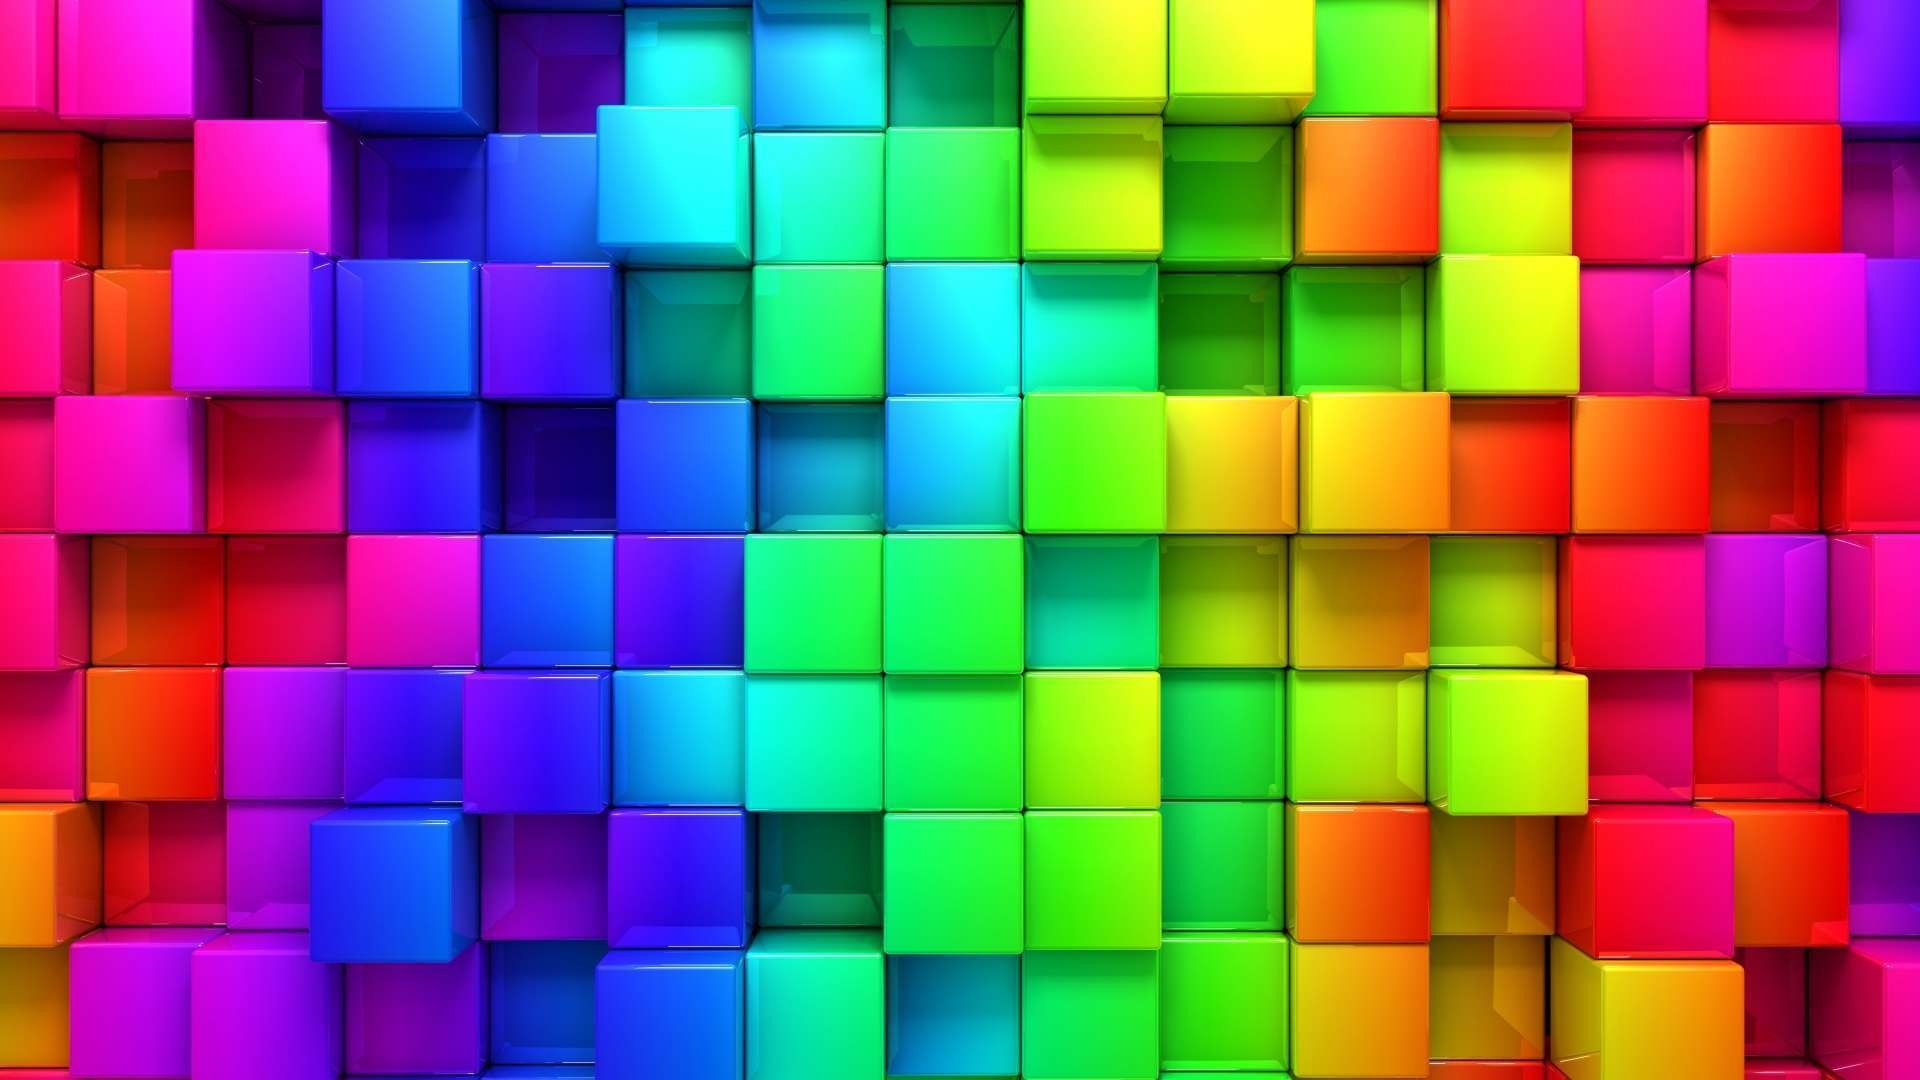 Blocks Rainbow Graphics Background Hd Wallpaper Hdwallwide 1920x1080px